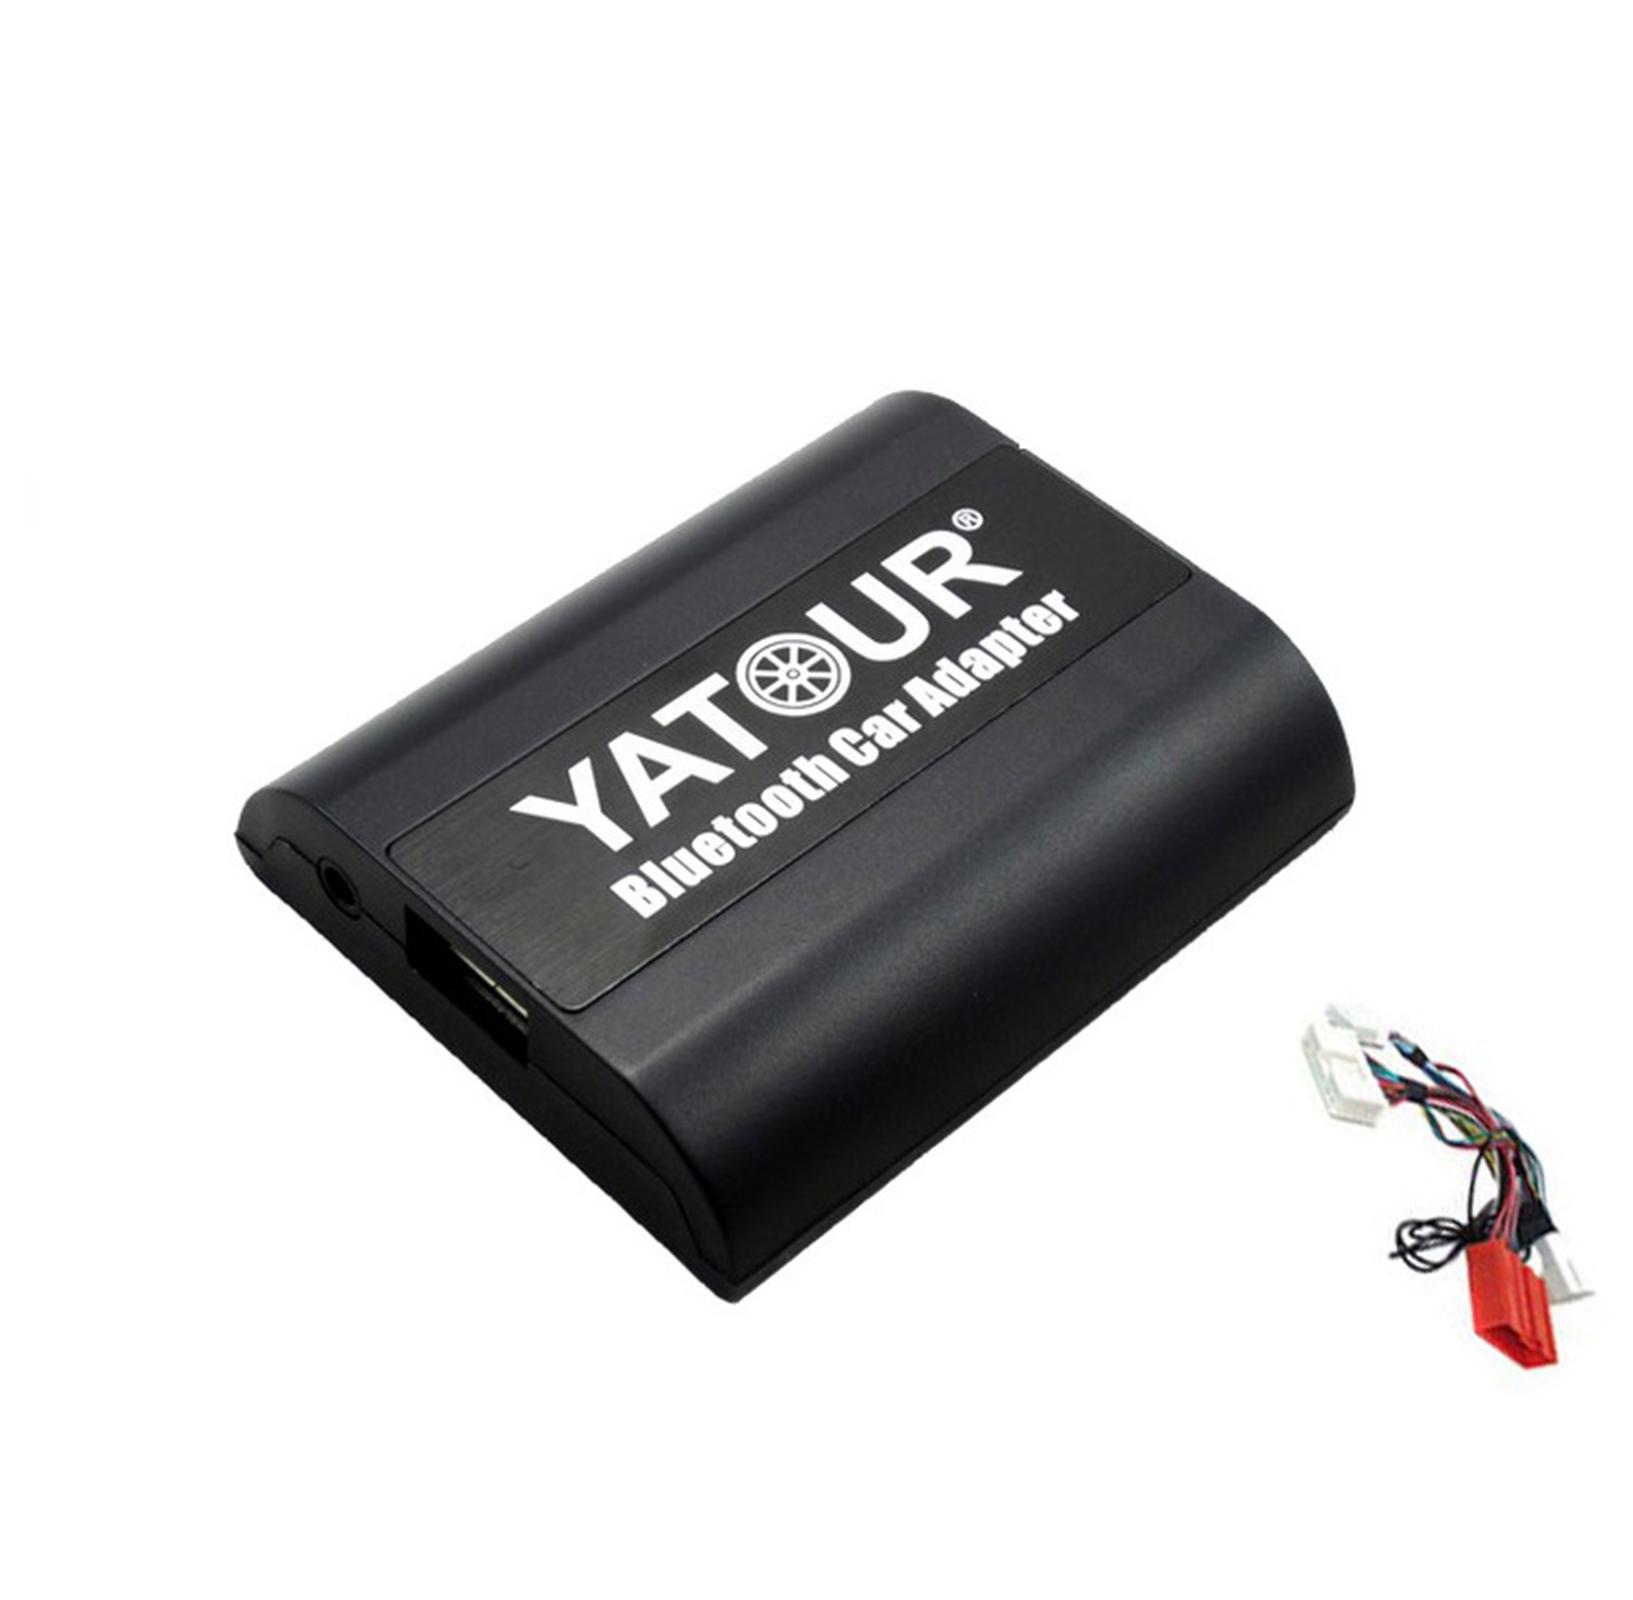 Kit Mains libres Bluetooth téléphonie & streaming audio pour Mazda 3, Mazda 5, Mazda 6, CX-5, CX-7 & RX-8 depuis 2009